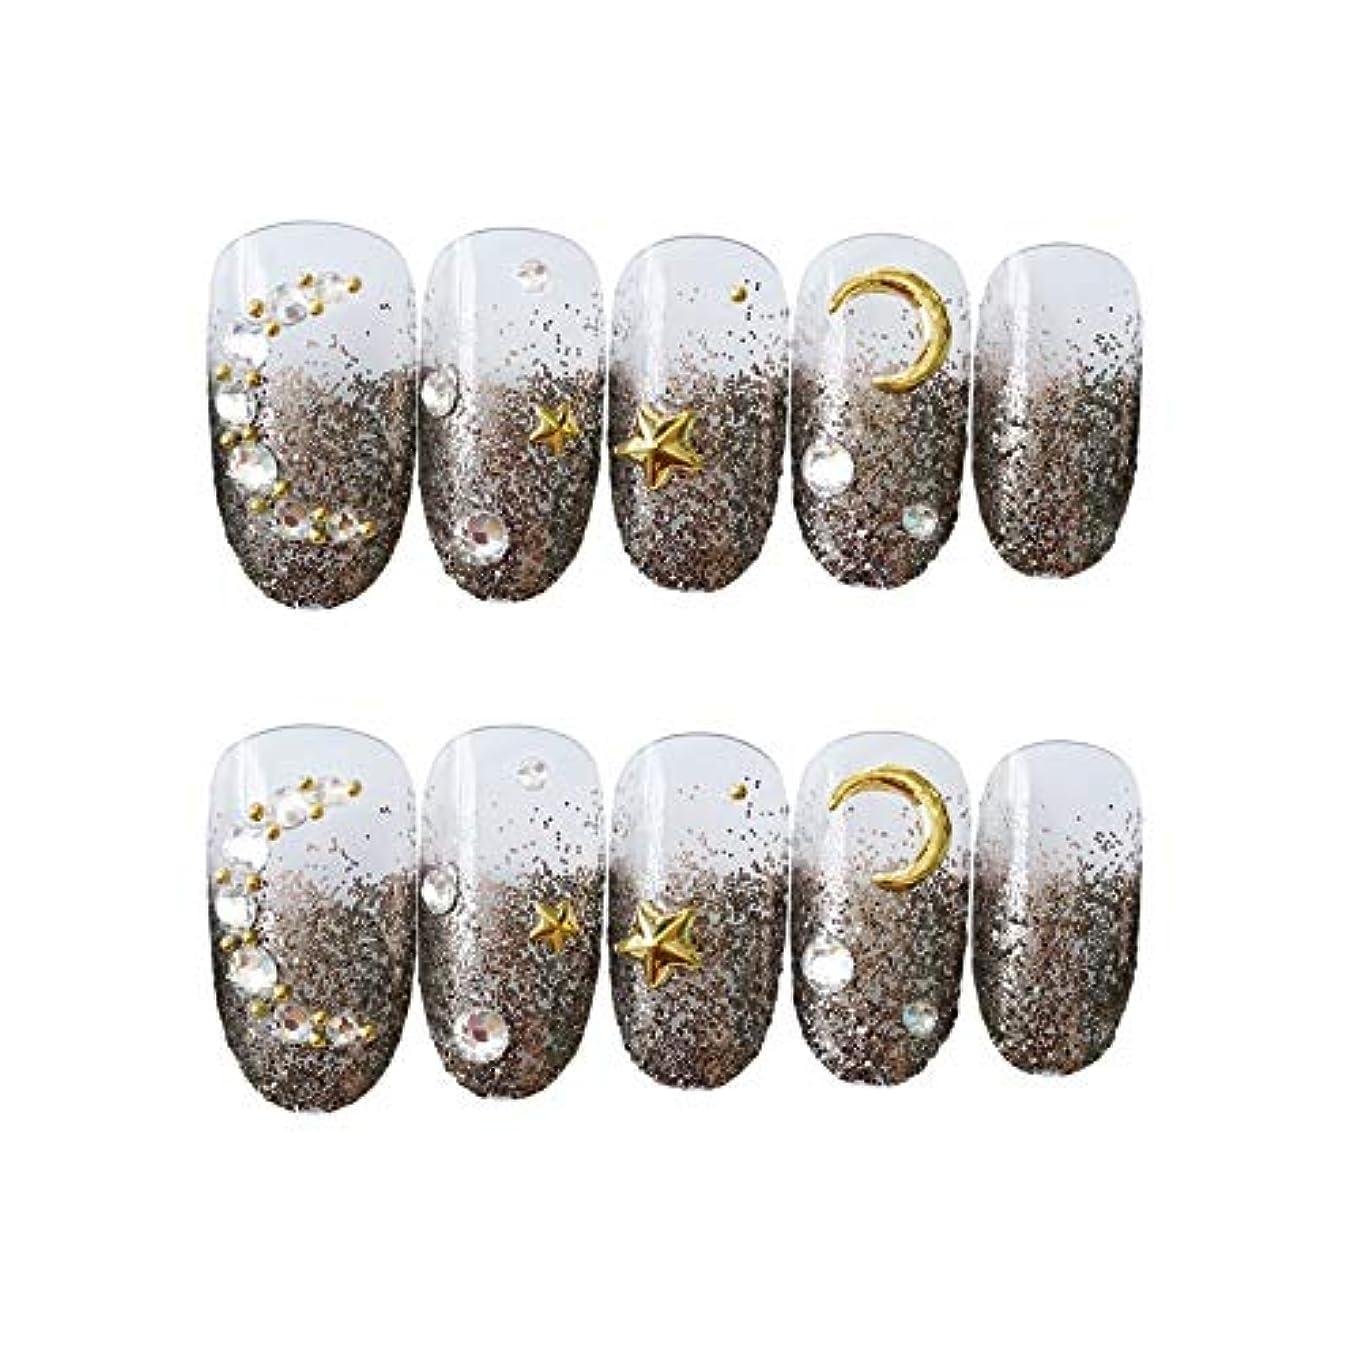 NANNAN ネイルチップ 3D ネイルチップ 綺麗な飾り付け 24枚入 原宿 和風 夢幻 和装 手作りネイルチップ 結婚式ネイルチップ